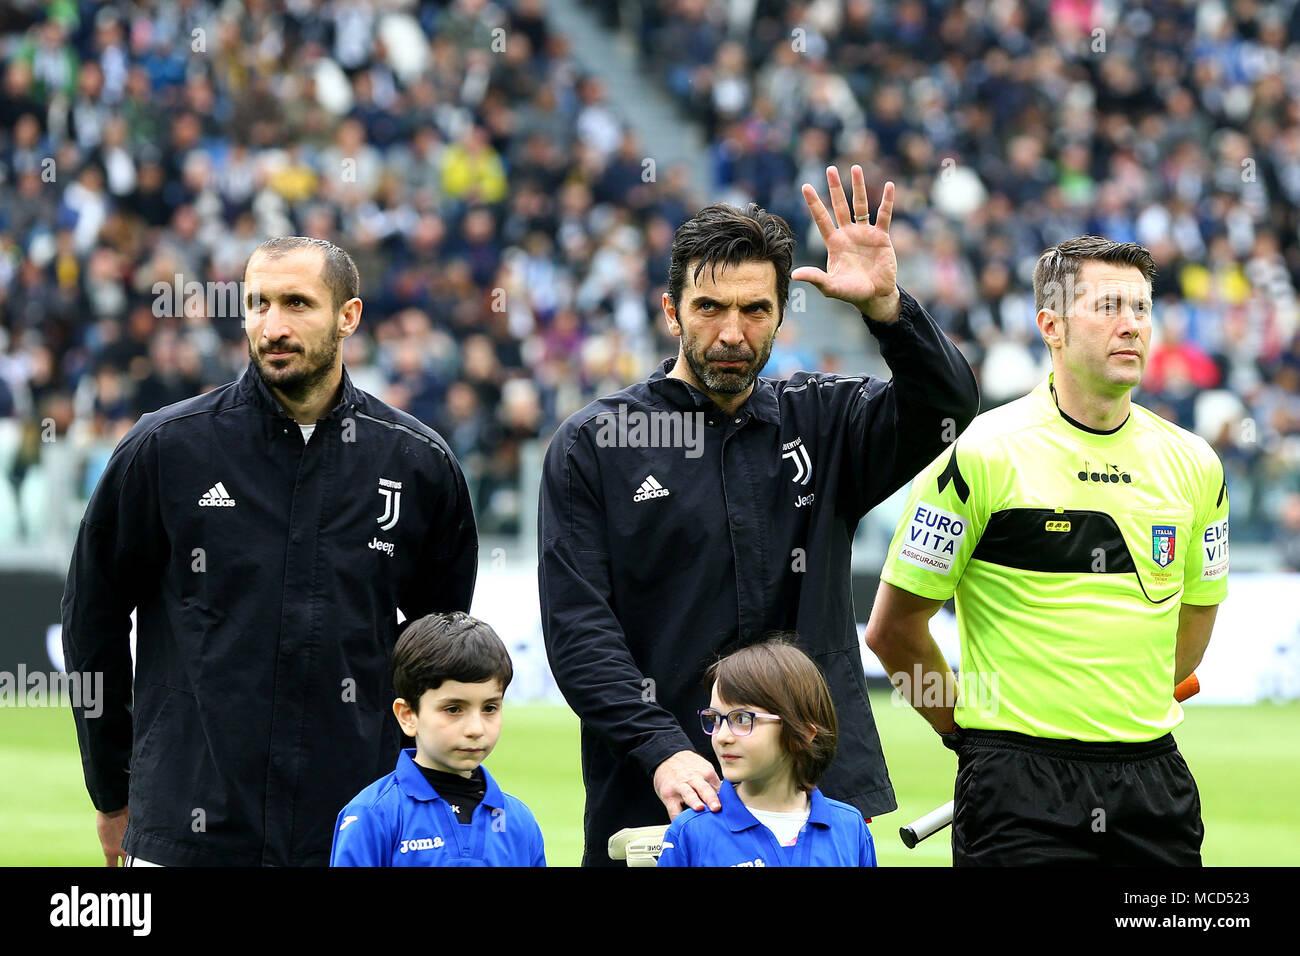 Italian Football Championship 2017-2018 62